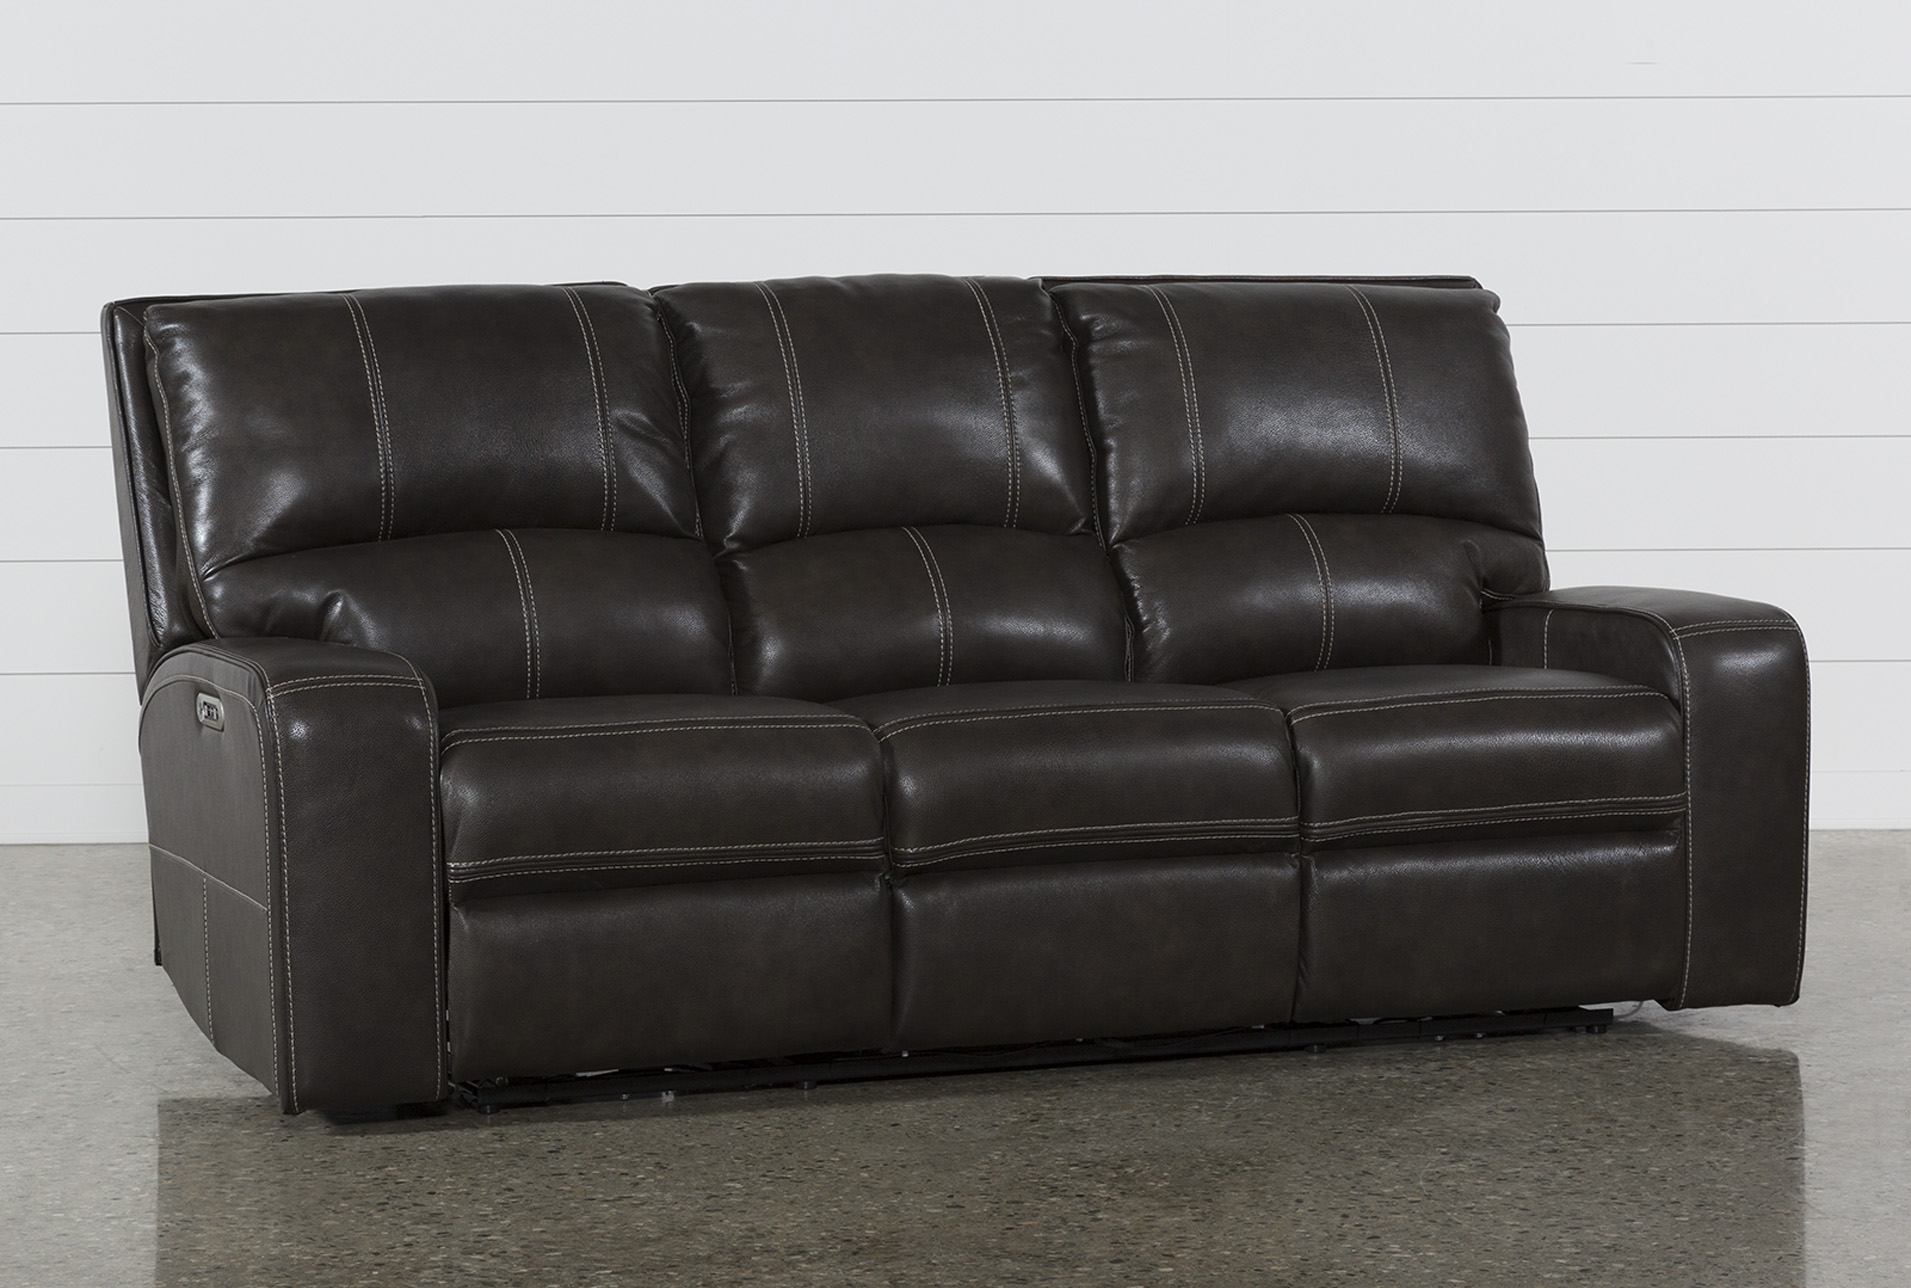 Clyde Grey Leather Power Reclining Sofa W Power Headrest Usb